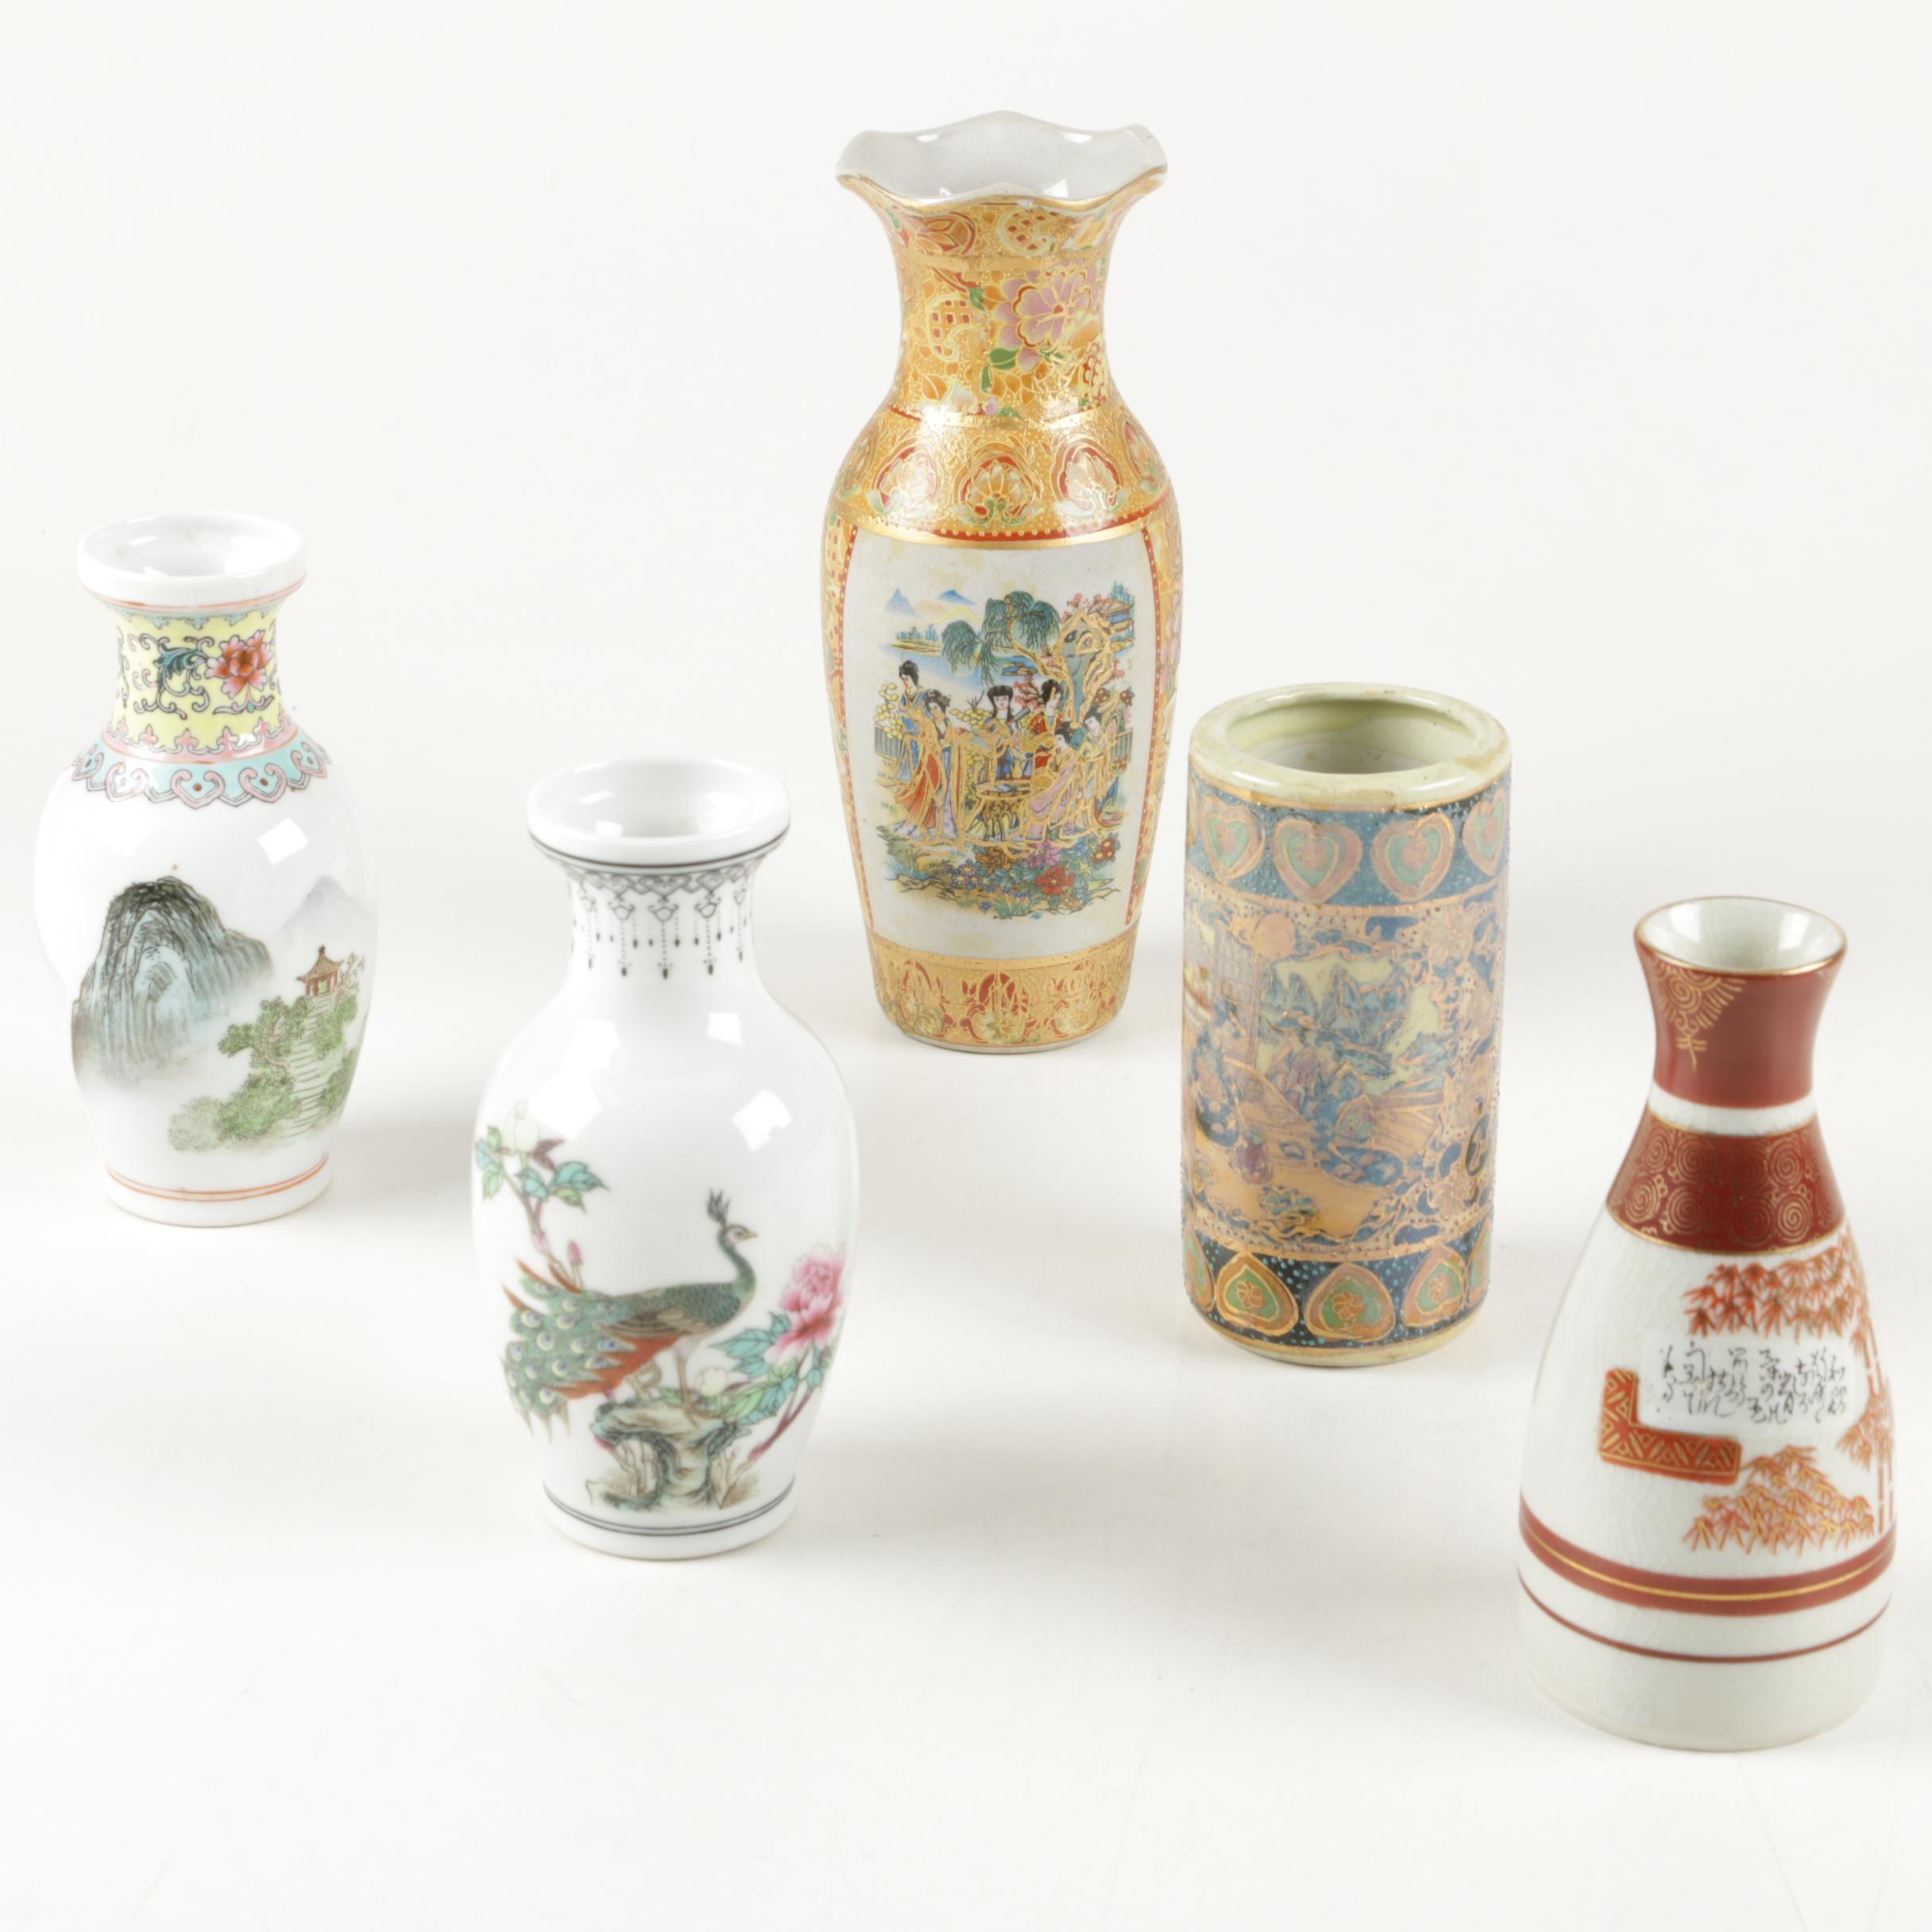 Ceramic and Porcelain Vases